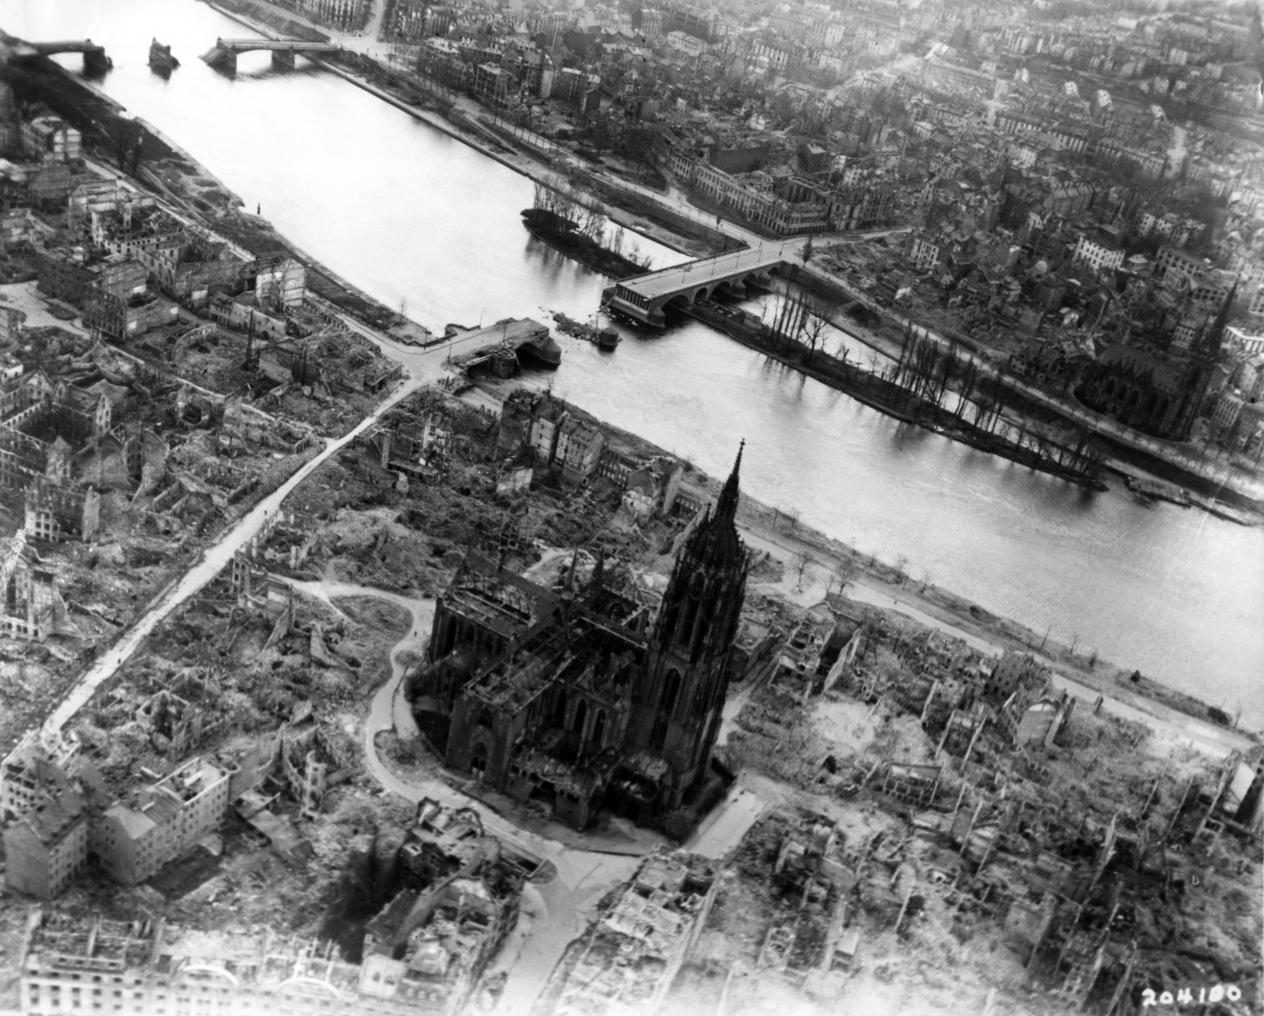 Frankfurt_Am_Main-Altstadt-Zerstoerung-Luftbild_1944.jpg